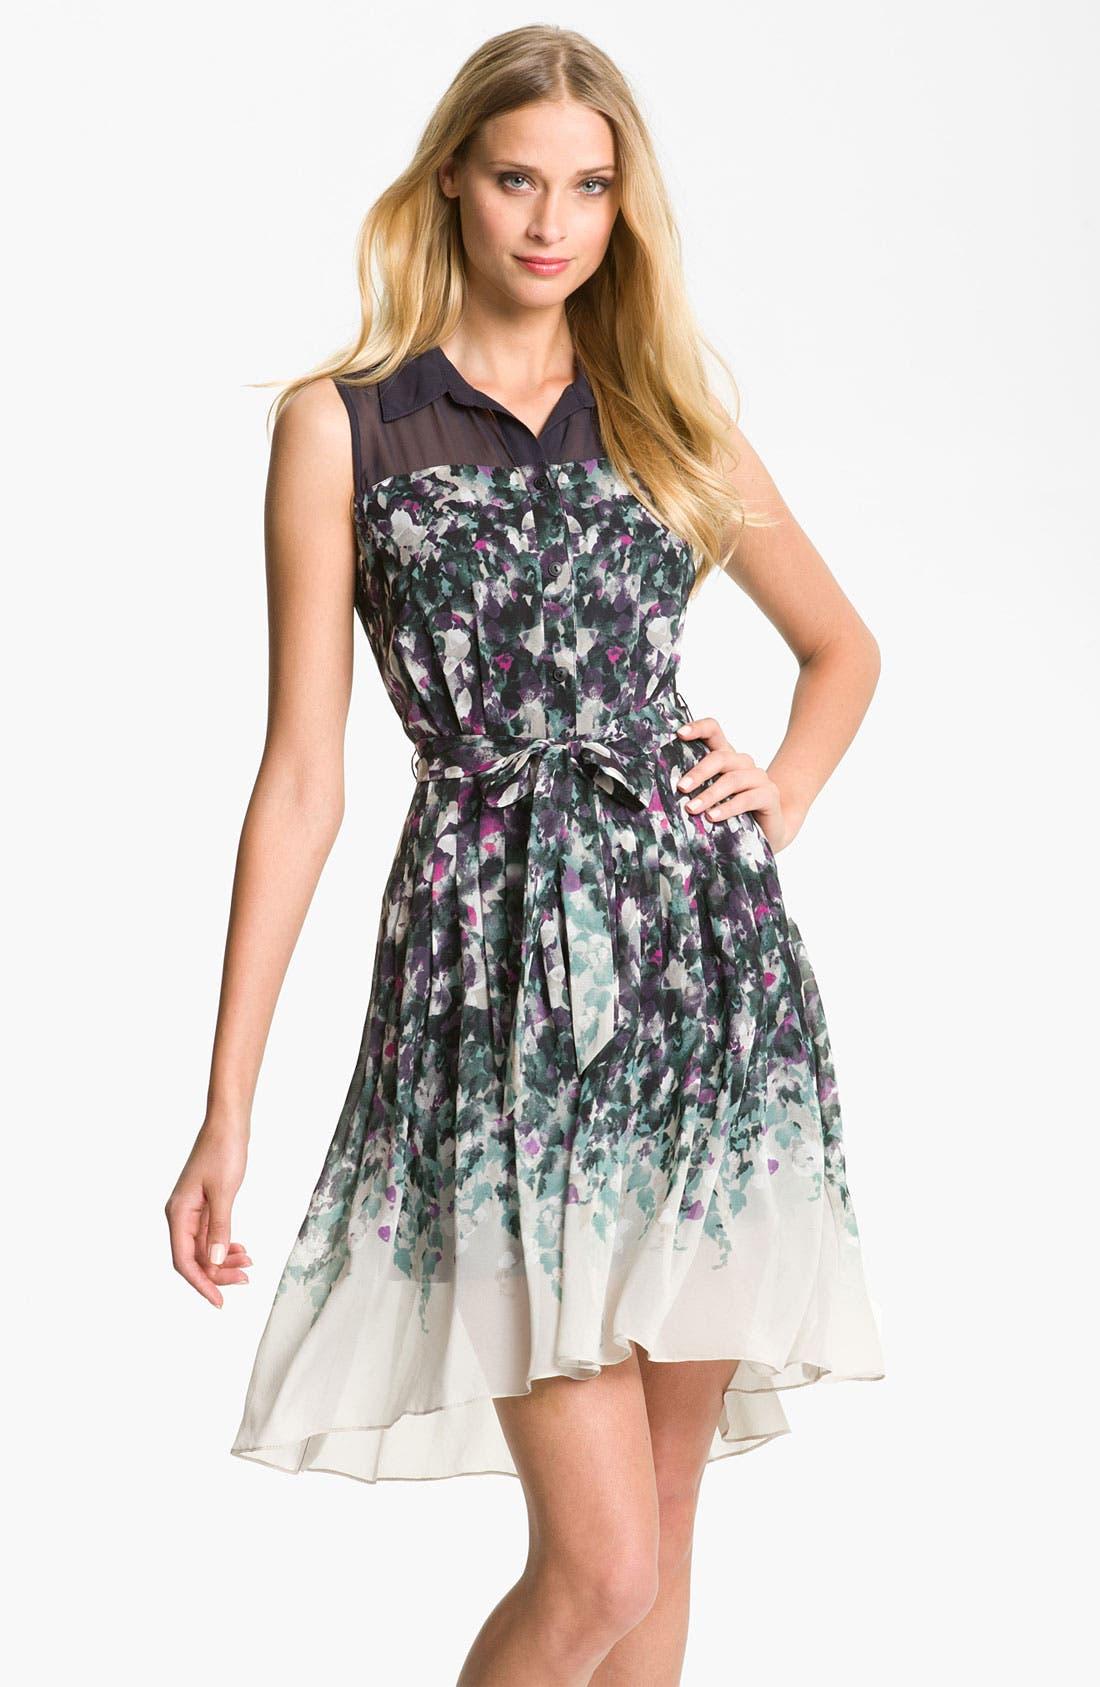 Main Image - Suzi Chin for Maggy Boutique Collared Illusion Yoke Dress